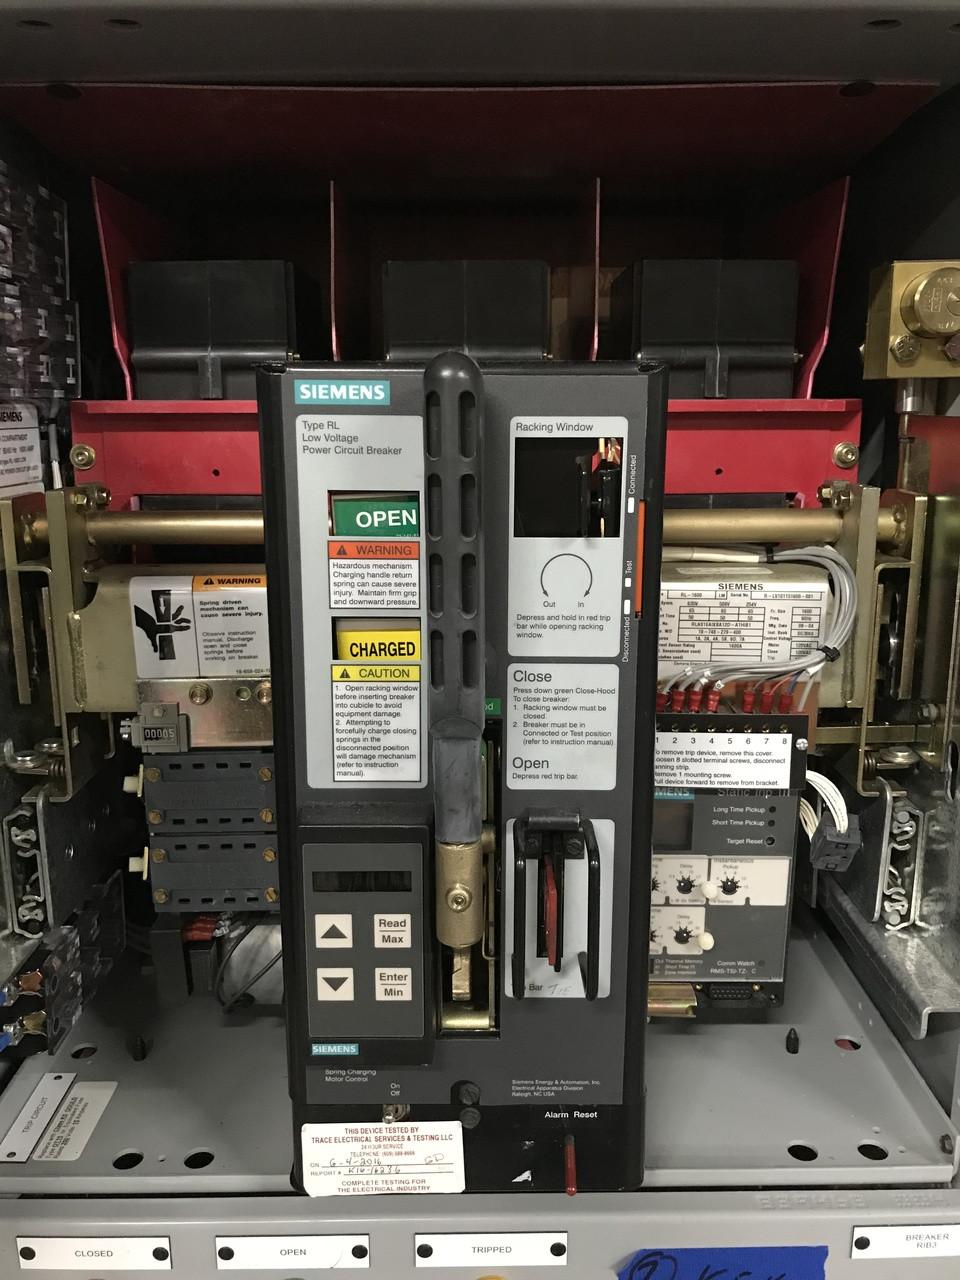 Siemens Rl Breaker Wiring Diagram Explore Schematic Cubicle 1600 1600a Eo Do Lsi Air Circuit Bullock Breakers Rh Bullockbreakers Com Mcc Starter Diagrams 3 Phase Motor